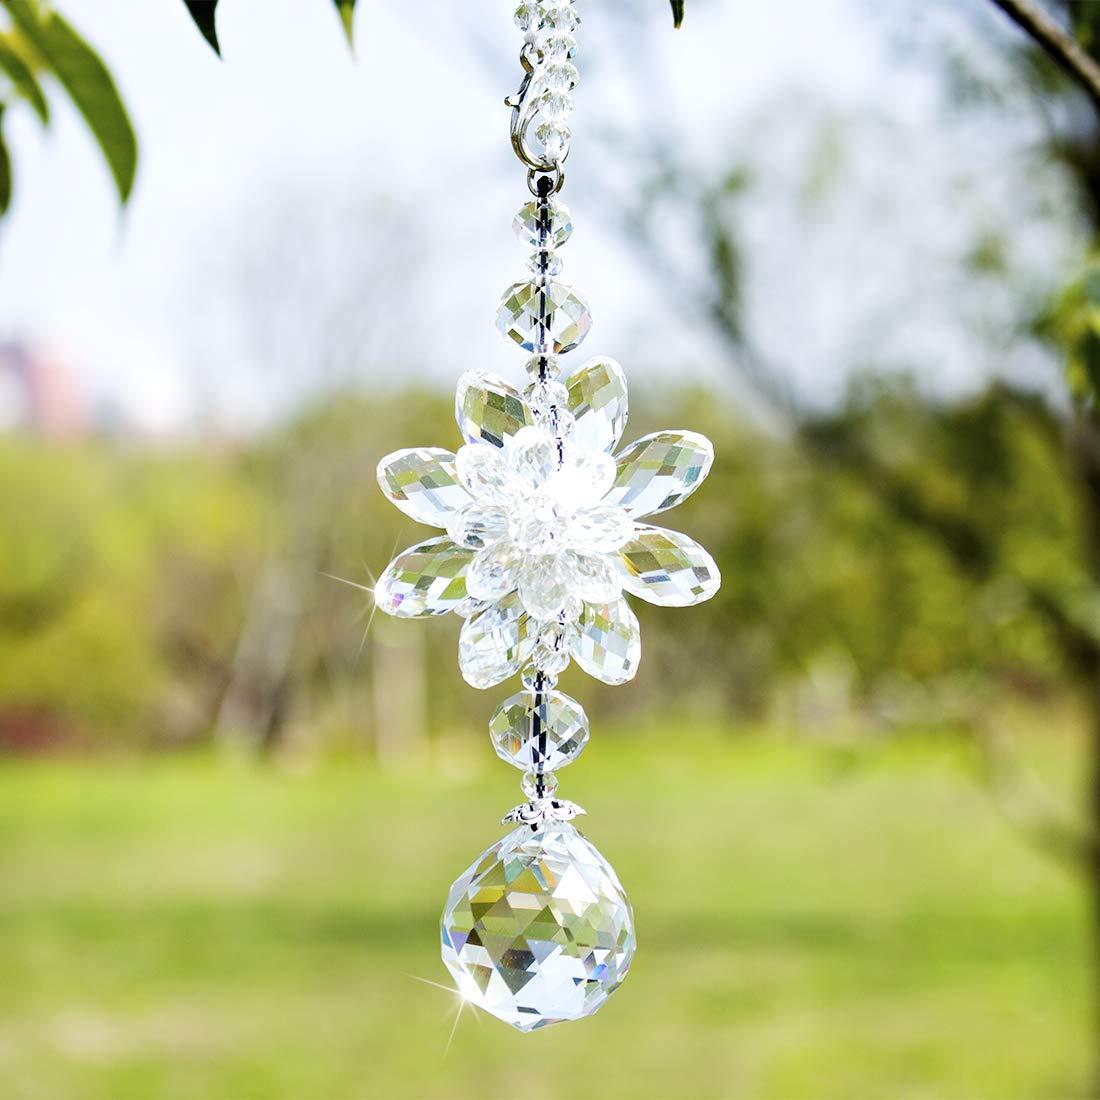 H&D HYALINE & DORA Clear Hanging Crystal Ball Prisms Flower Fengshui Ornament Suncatcher Rear View Mirror Car Charm Decor